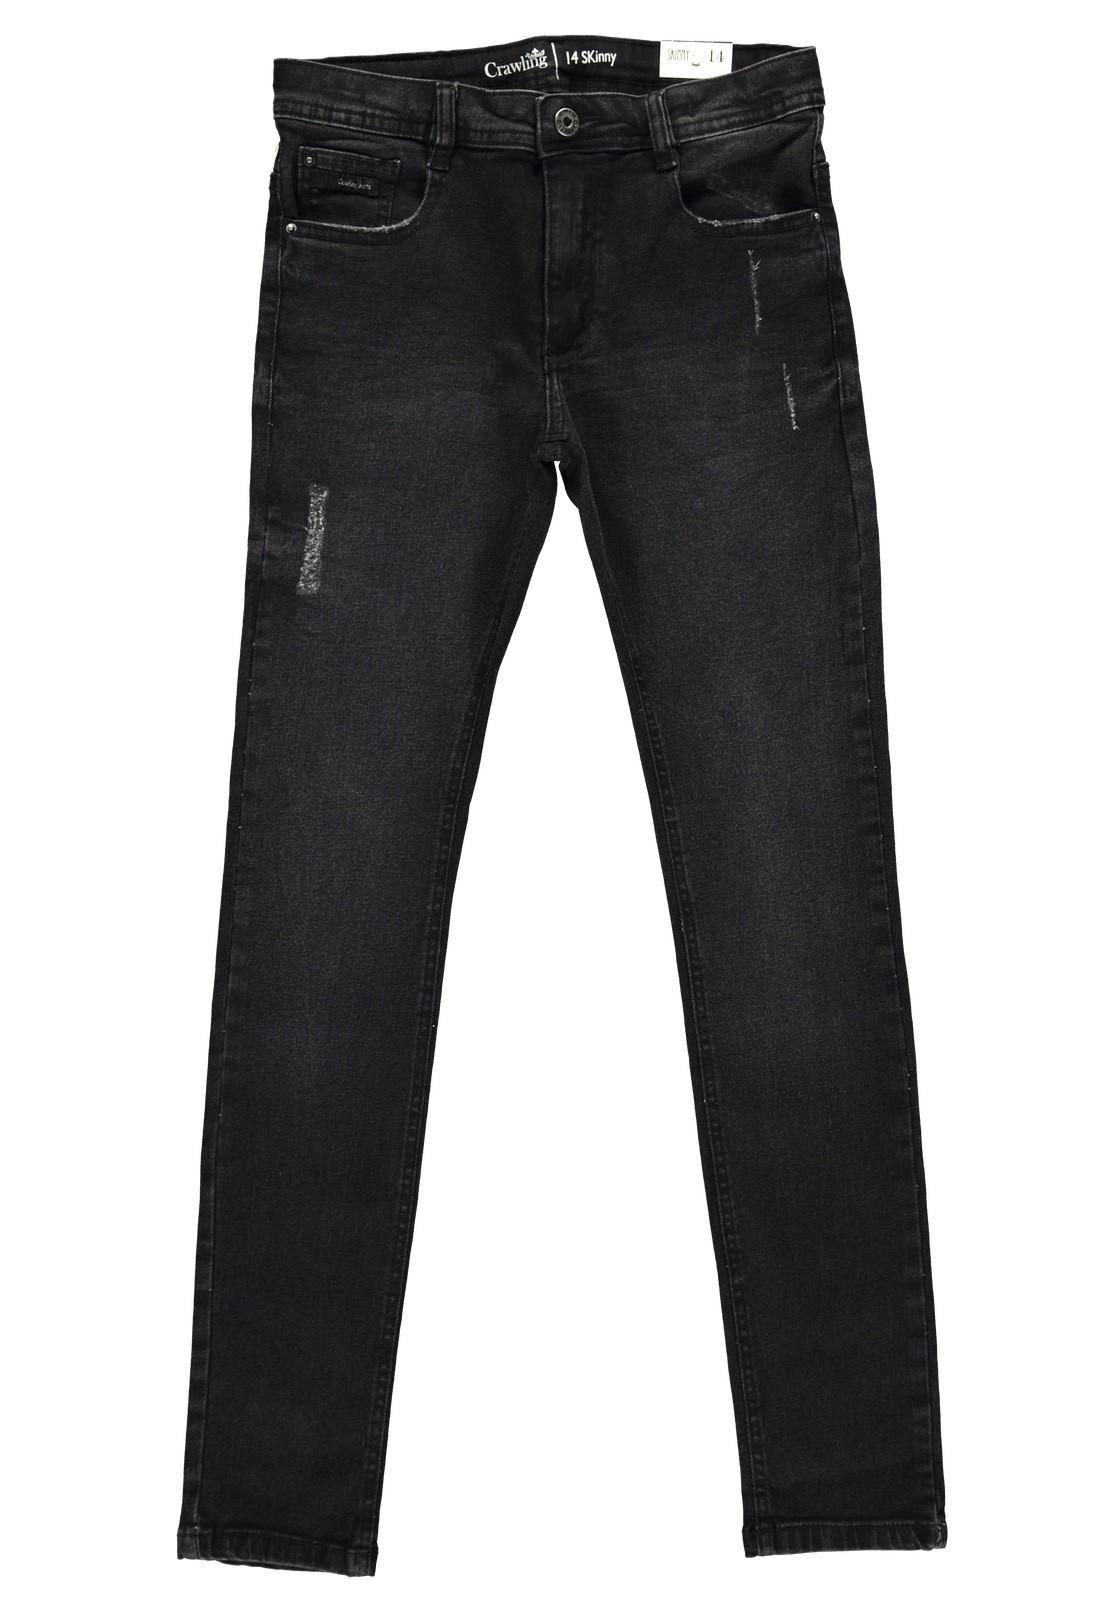 Calça Jeans Masculina Crawling Skinny Black